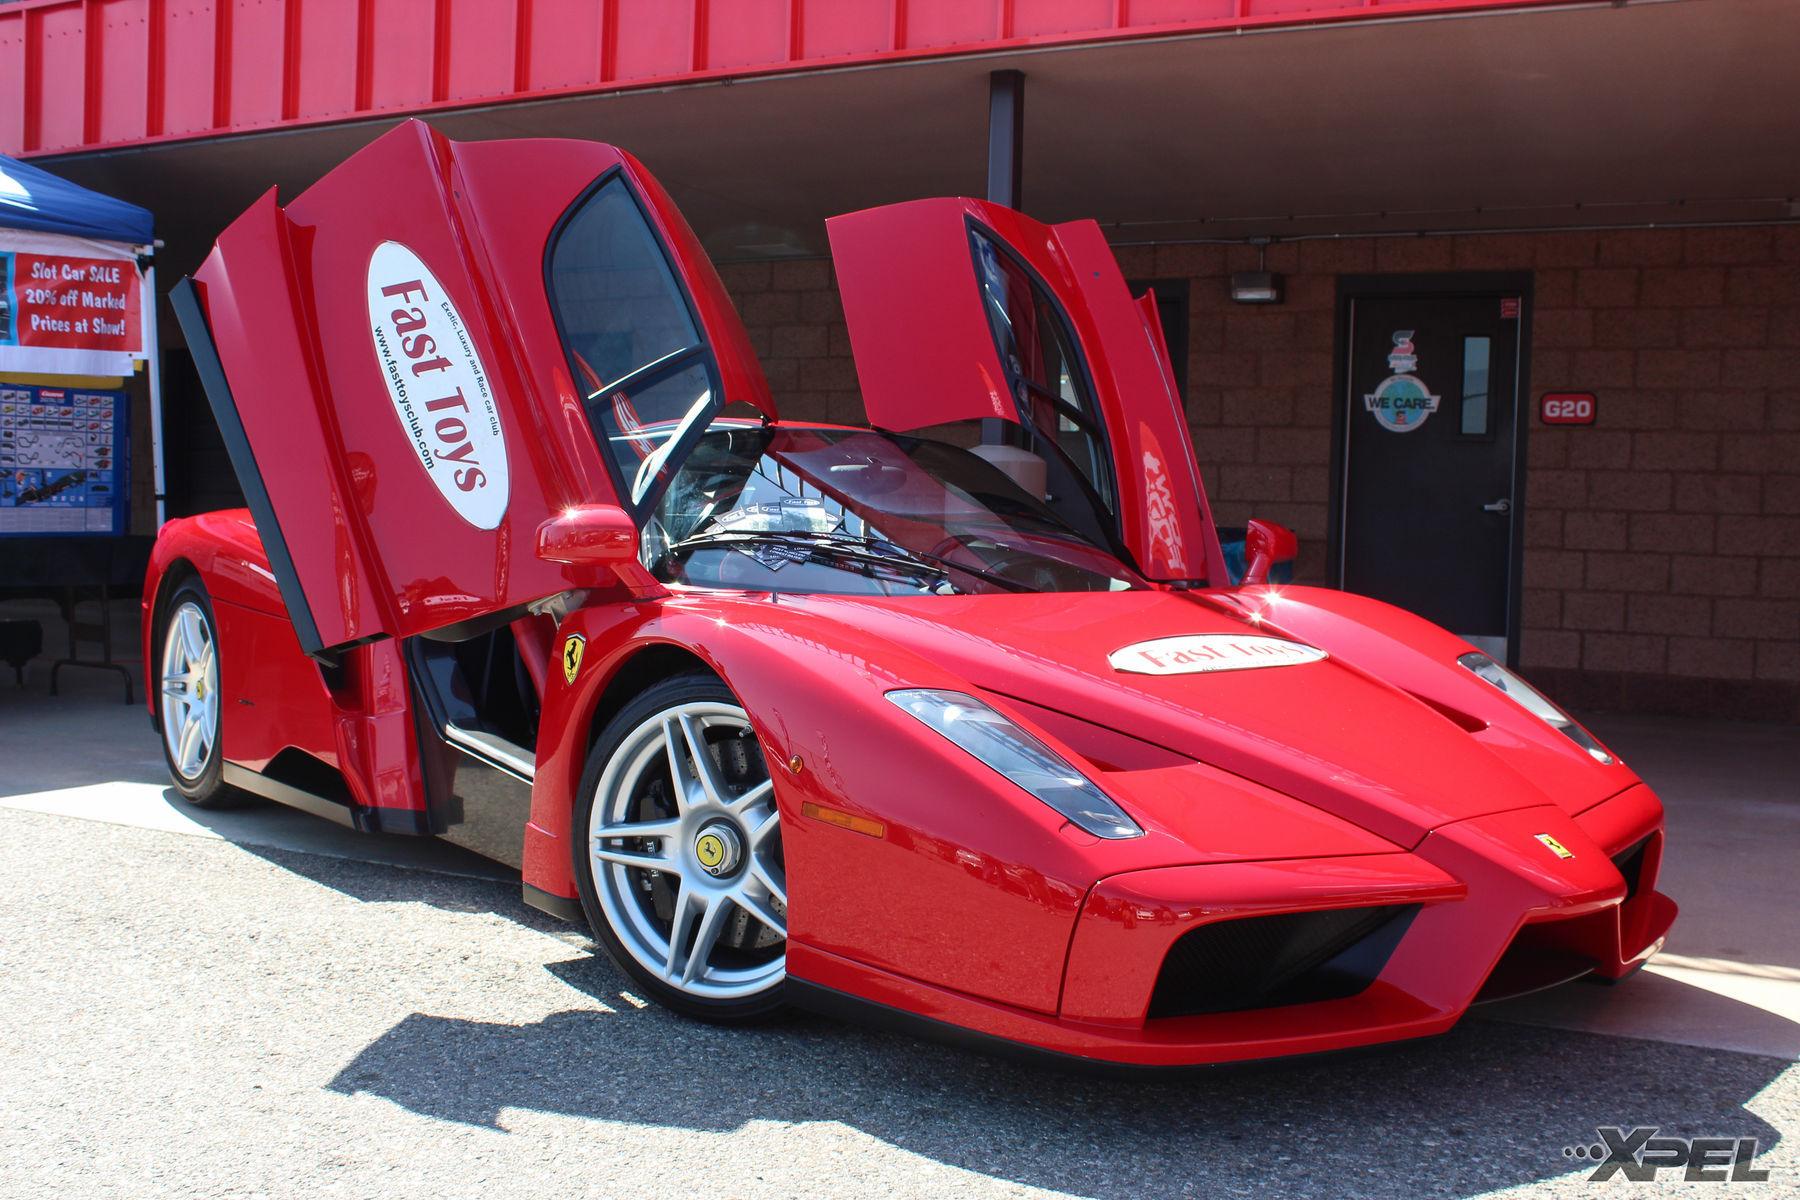 Ferrari Enzo | Ferrari Enzo at Fast Toys at the California Festival of Speed 2015